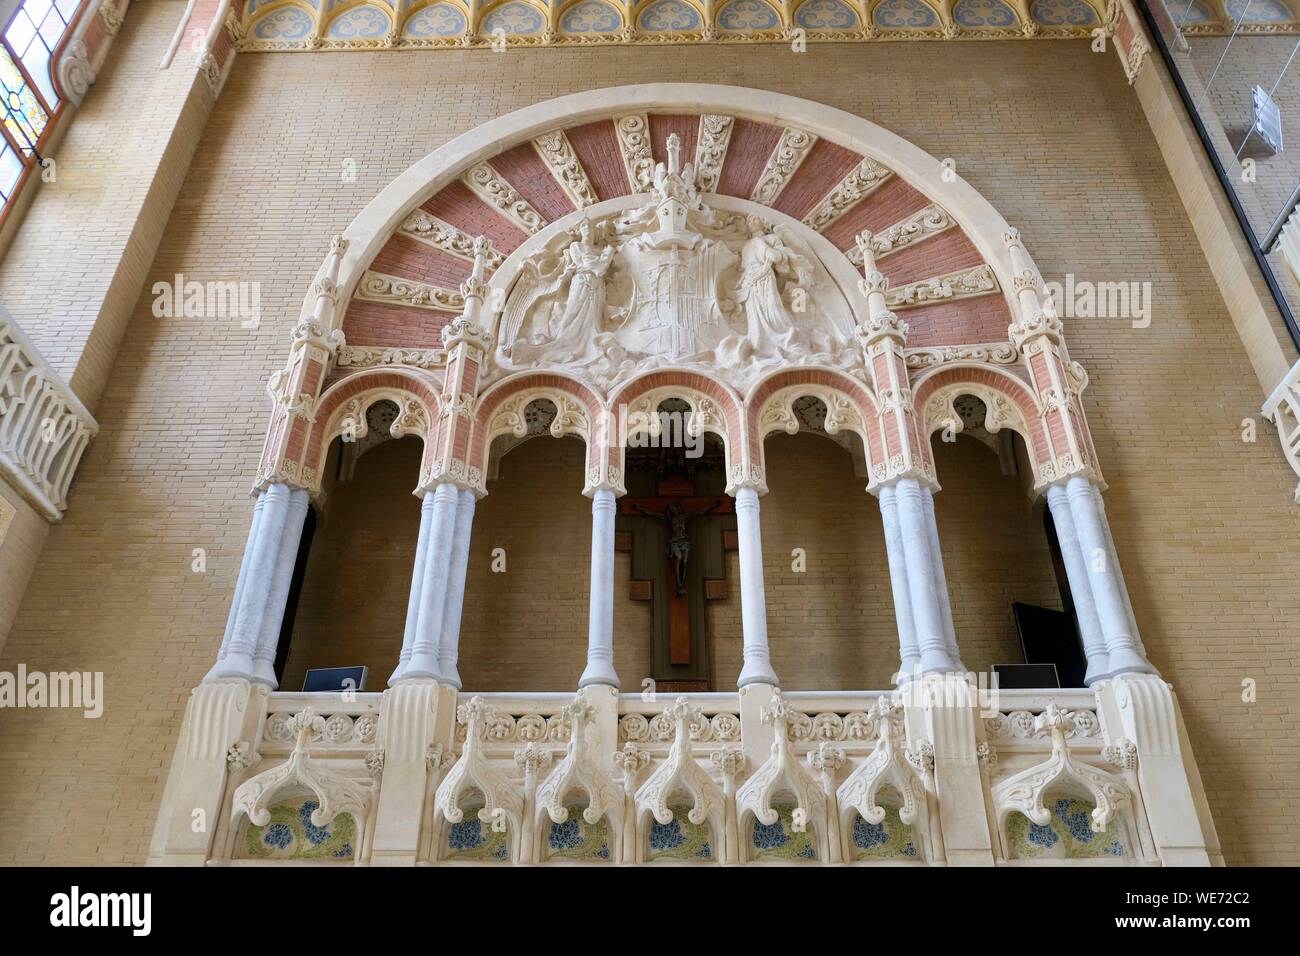 España, Cataluña, Barcelona, El Distrito de Guinardo, Hospital de la Santa Creu i Sant Pau listados como Patrimonio Mundial por la UNESCO, con estilo modernista del Arquitecto Domenech i Montaner Foto de stock